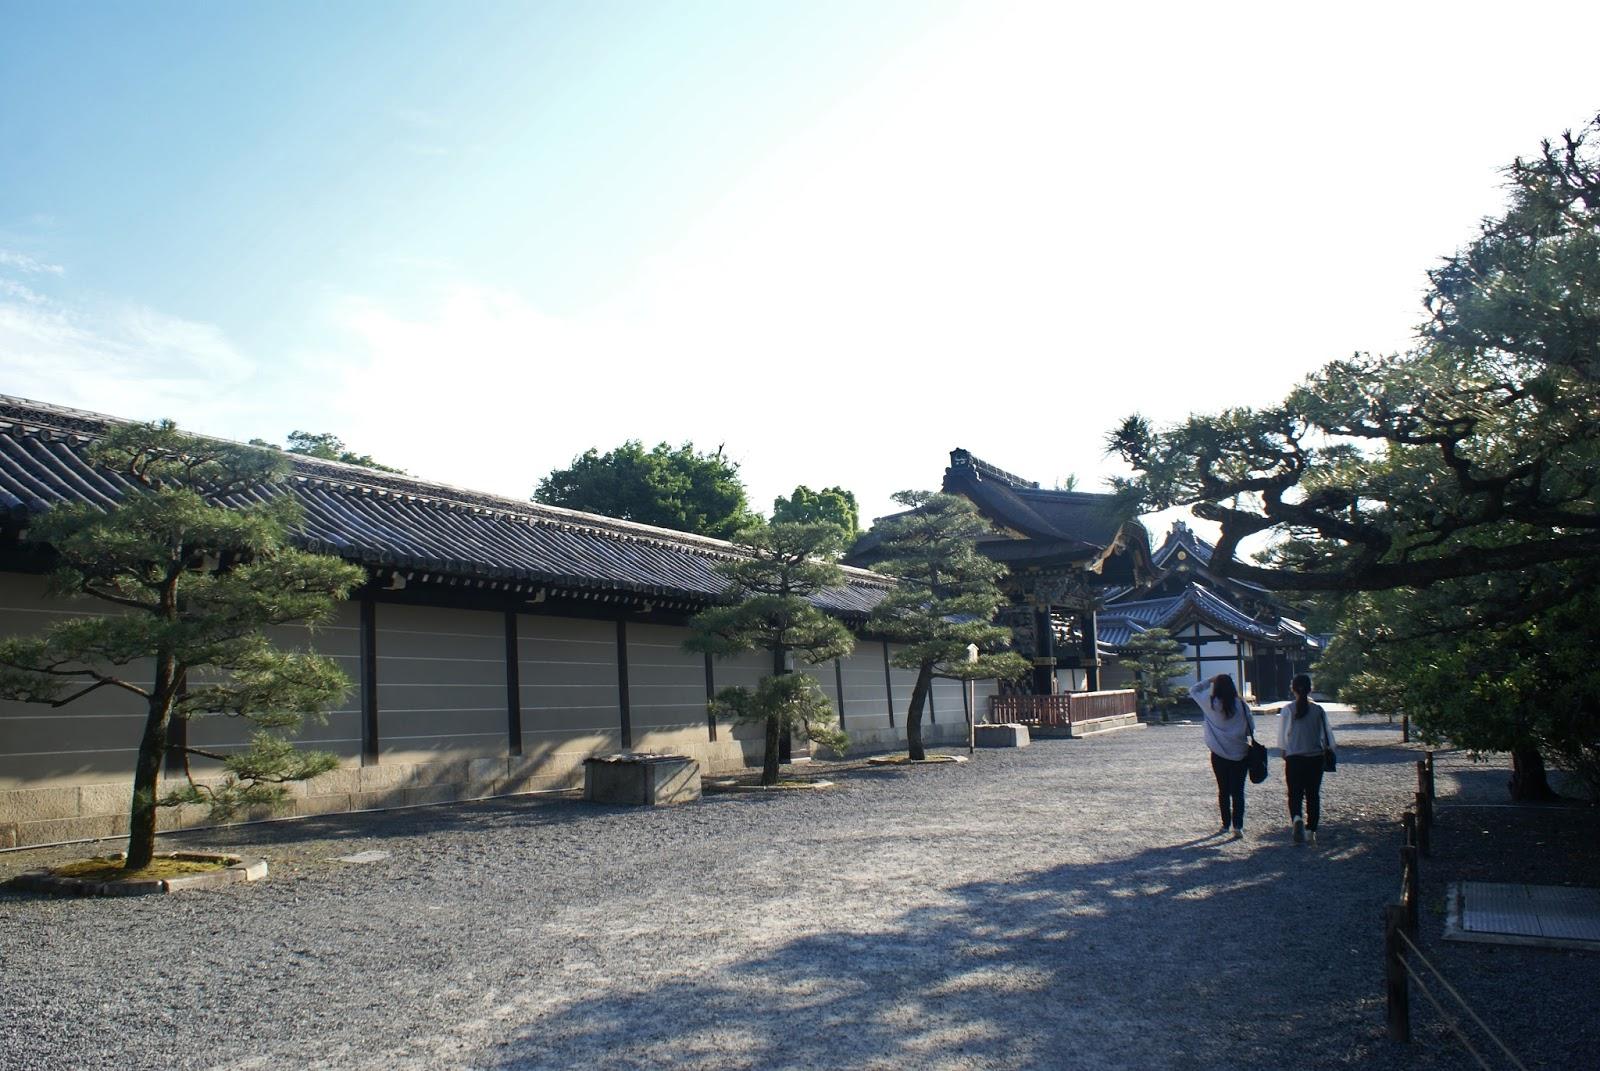 nishi hongan-ji buddhist temple kyoto japan japon asia